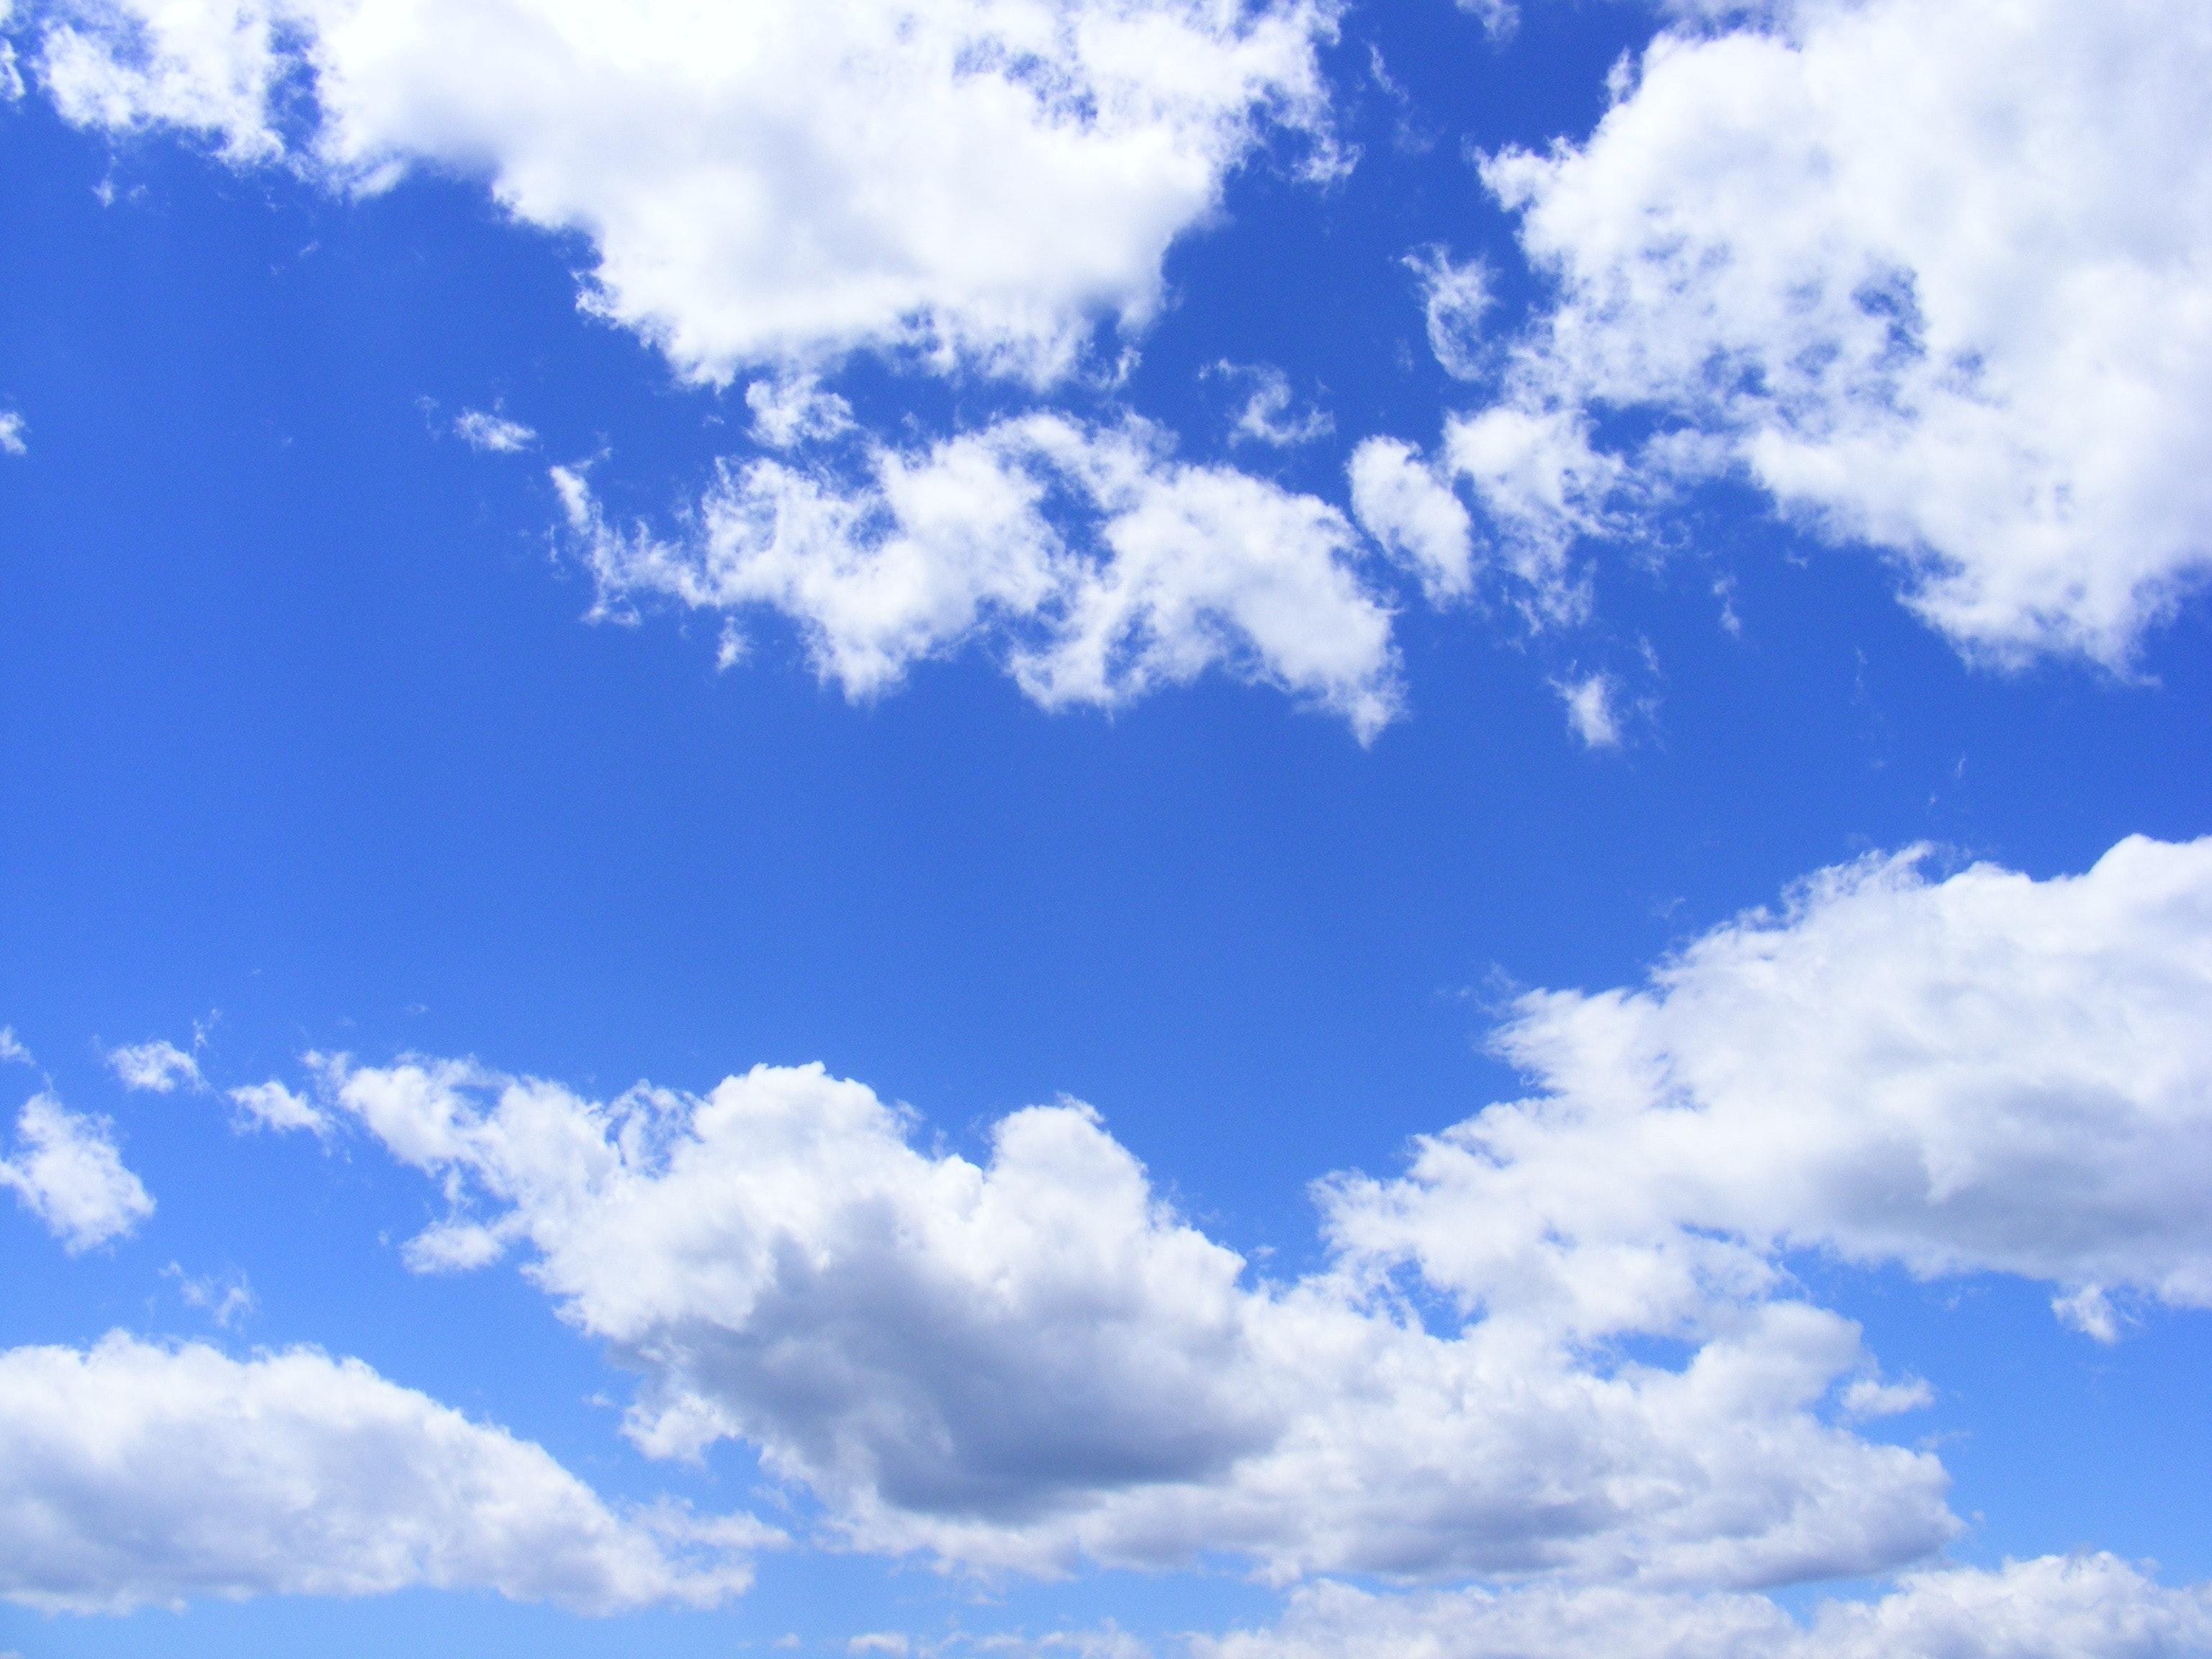 cloud images pexels free stock photos. Black Bedroom Furniture Sets. Home Design Ideas